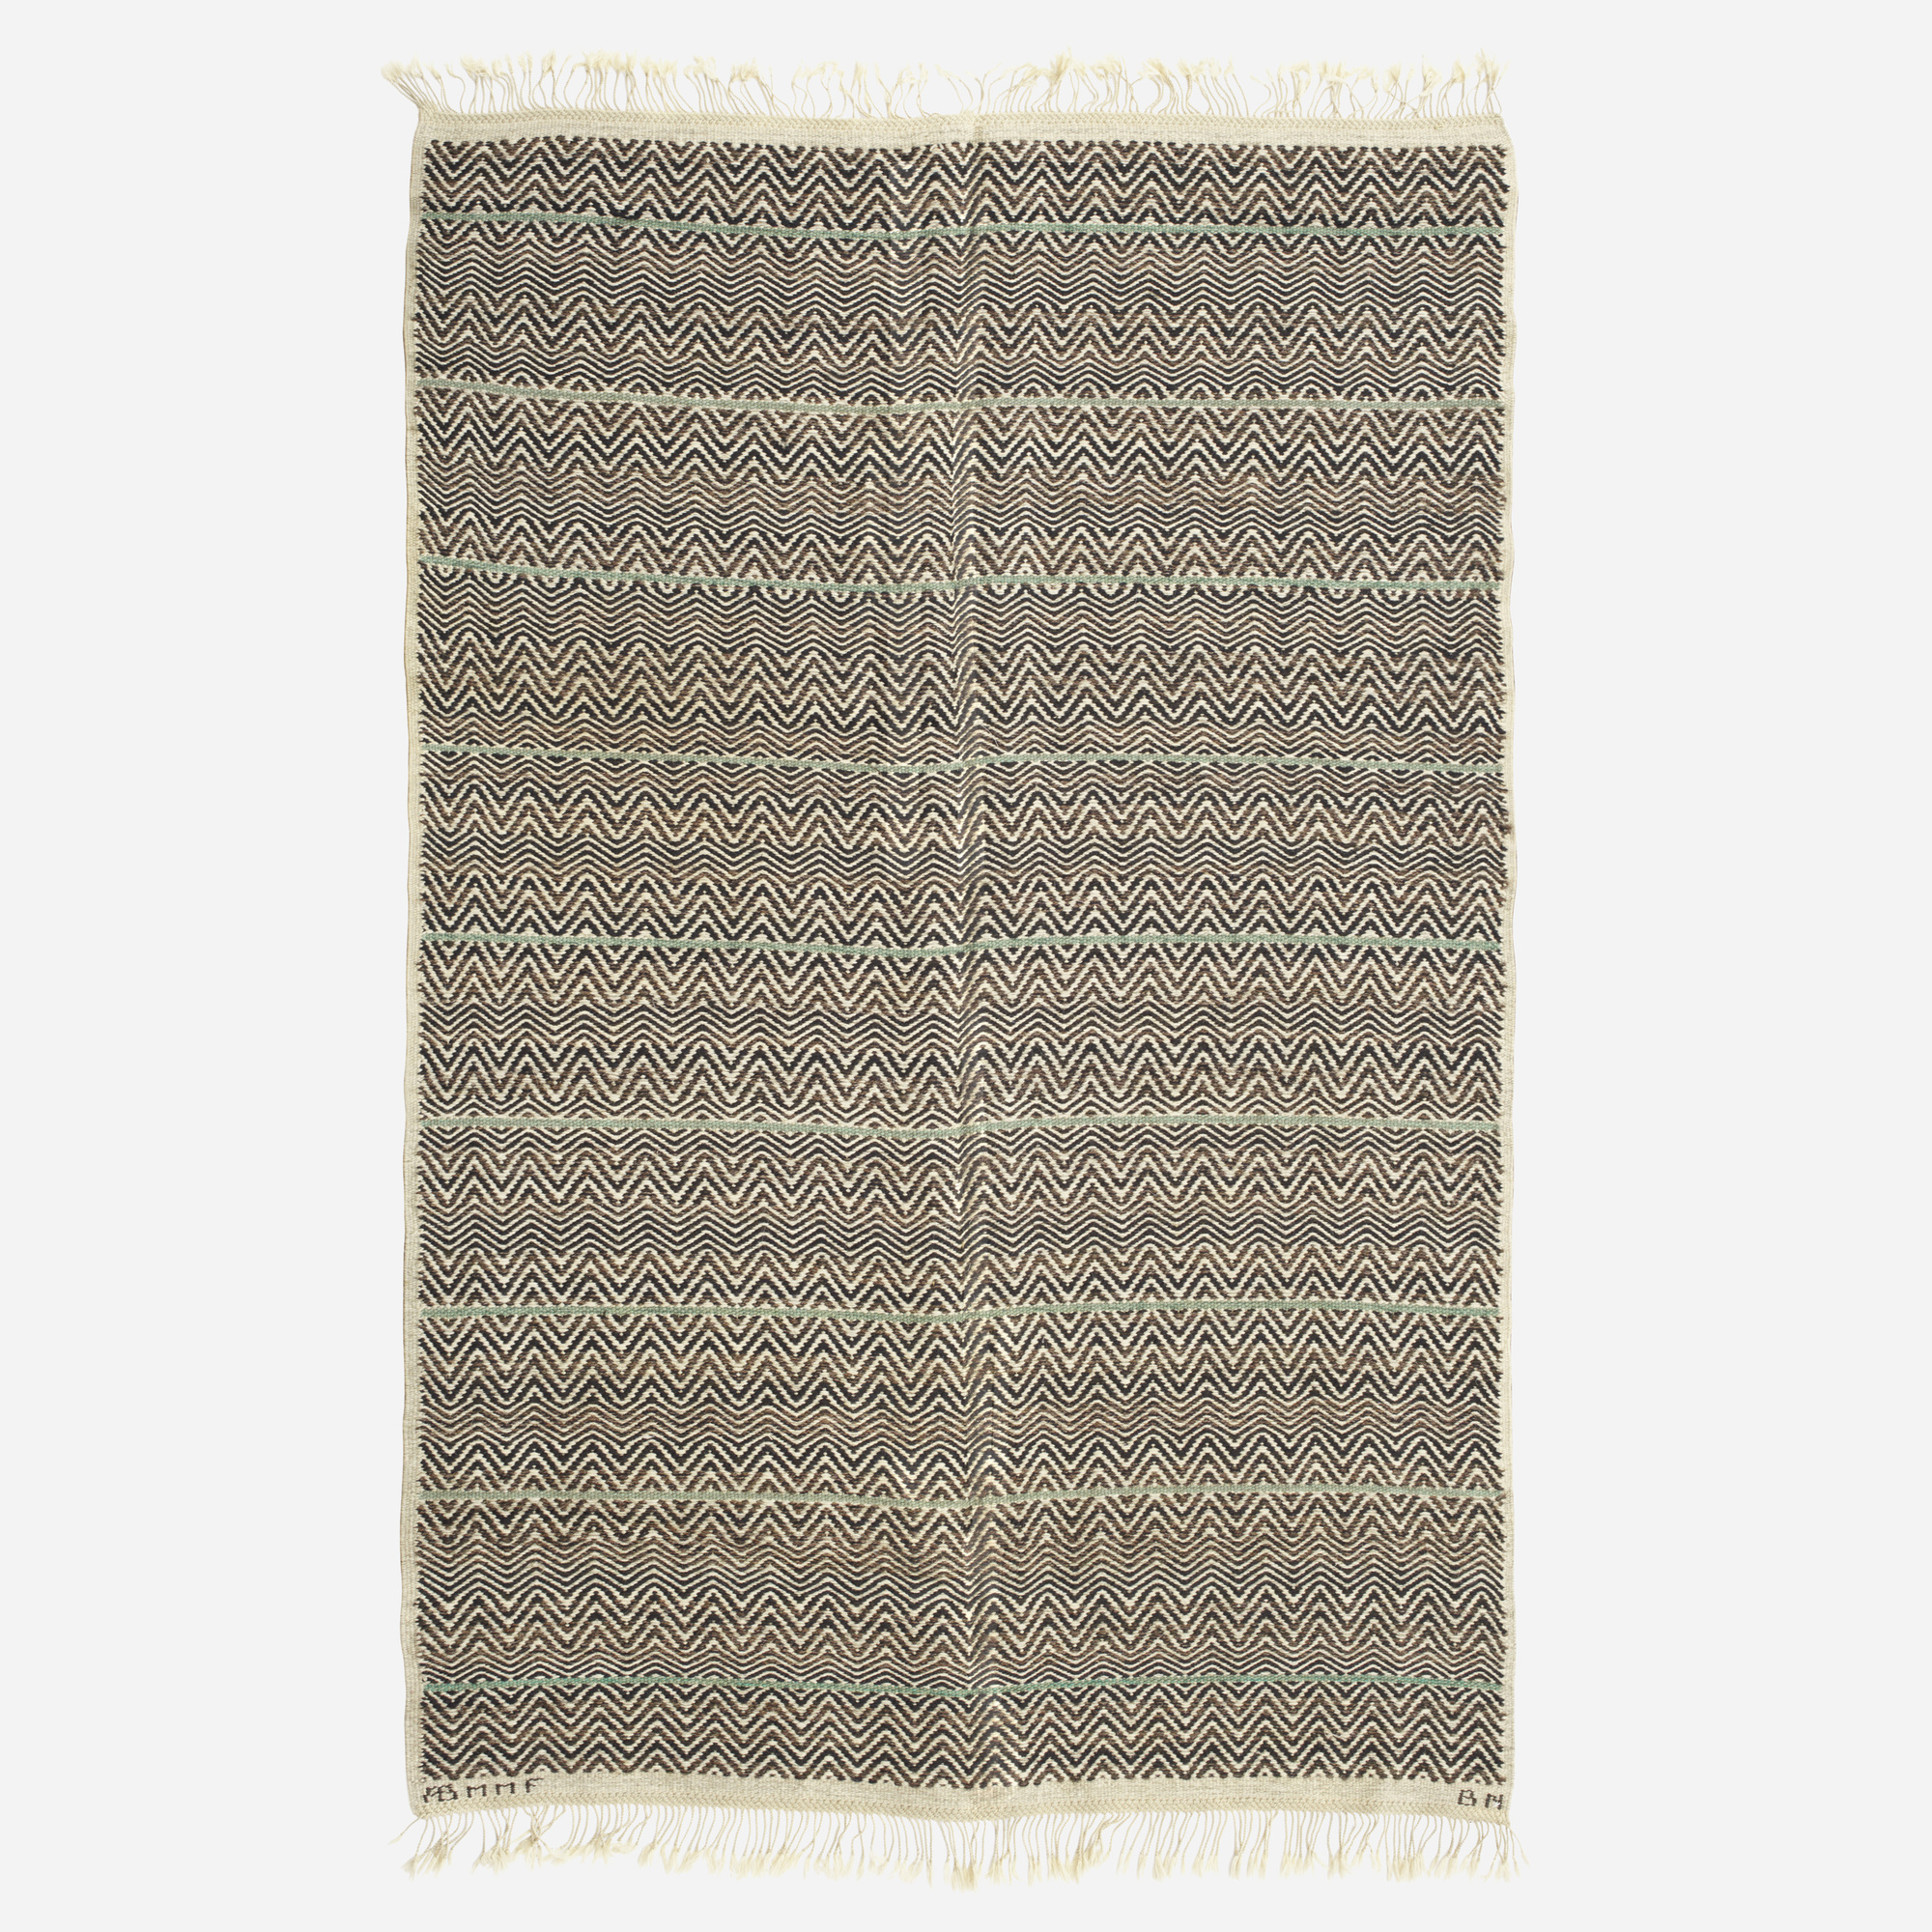 164: Barbro Nilsson / Svart Rosengång flatweave carpet (1 of 2)